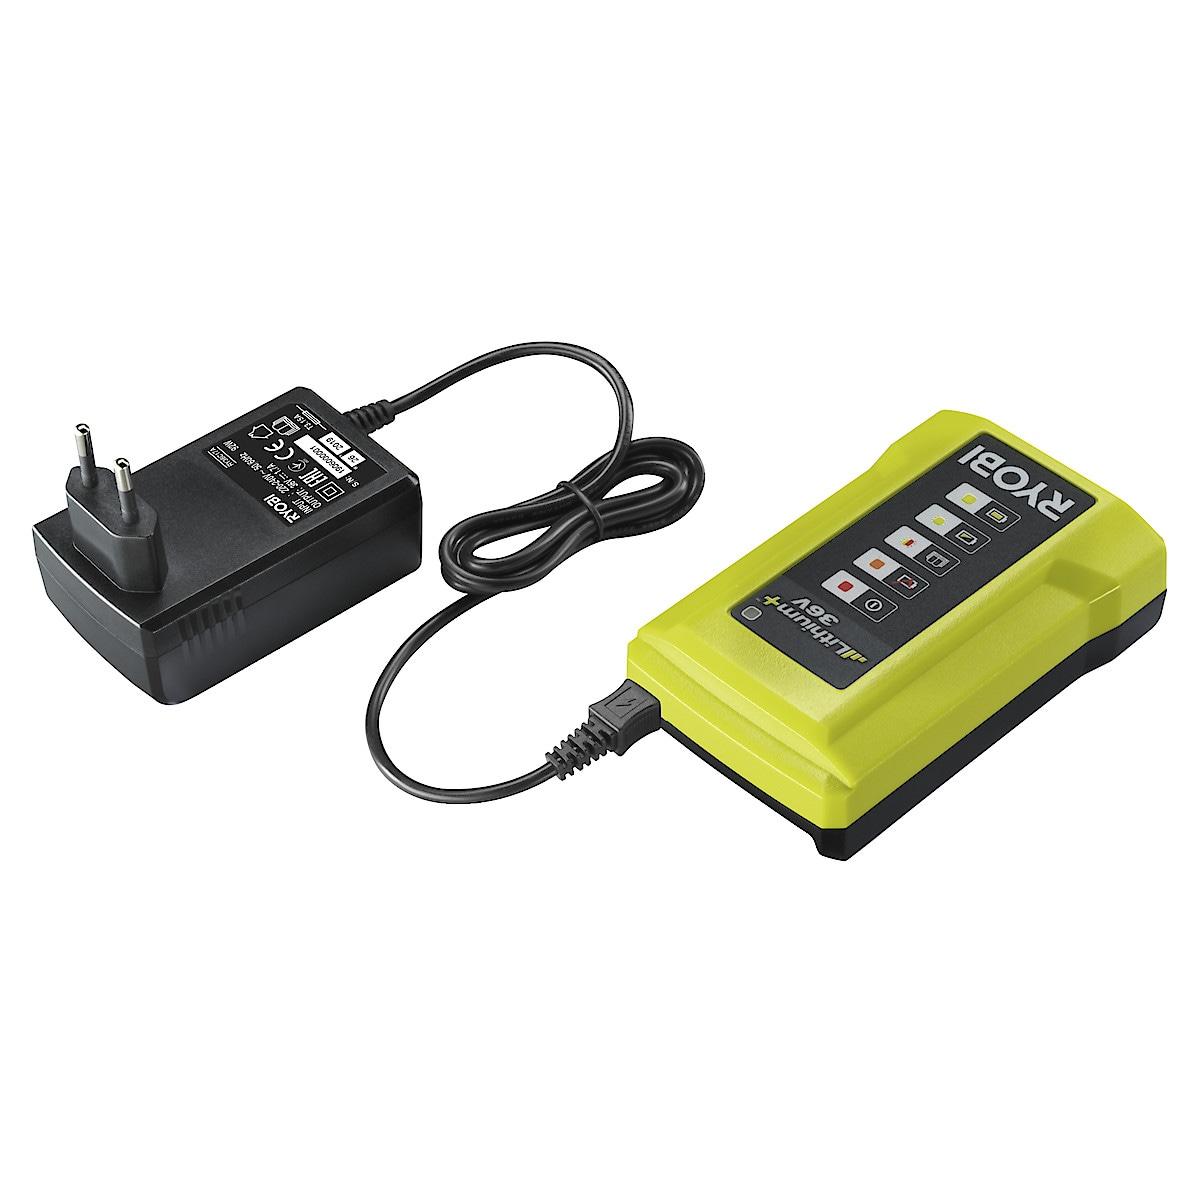 Ryobi batteriladdare RY36C17A